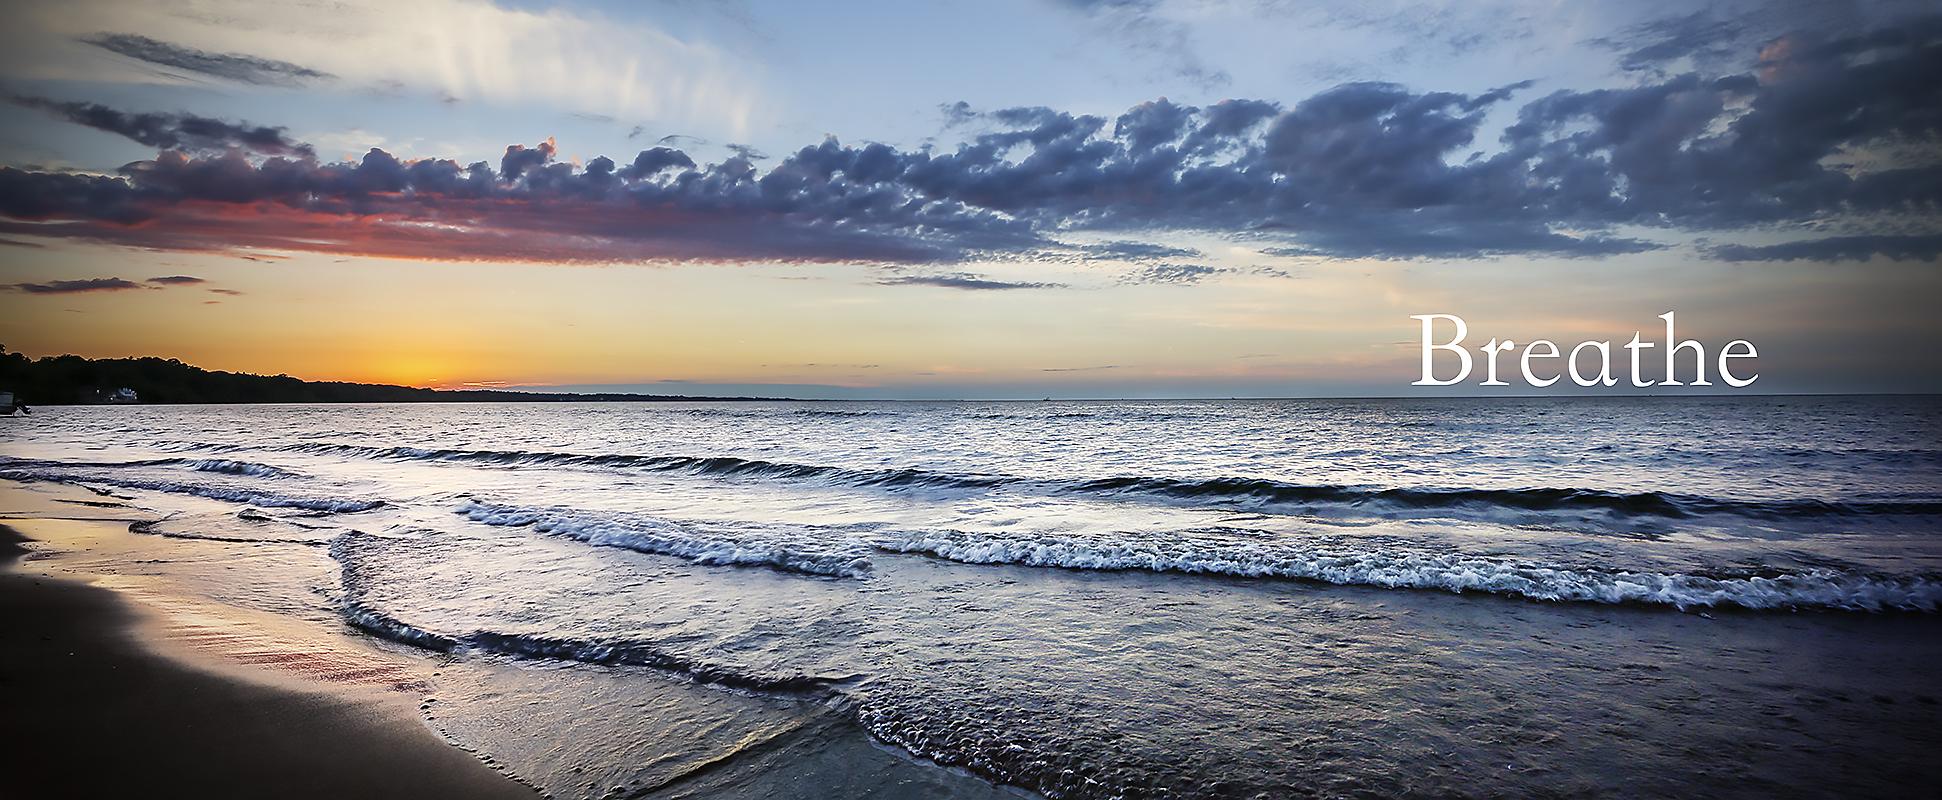 Sunset at seabreeze pier 2016